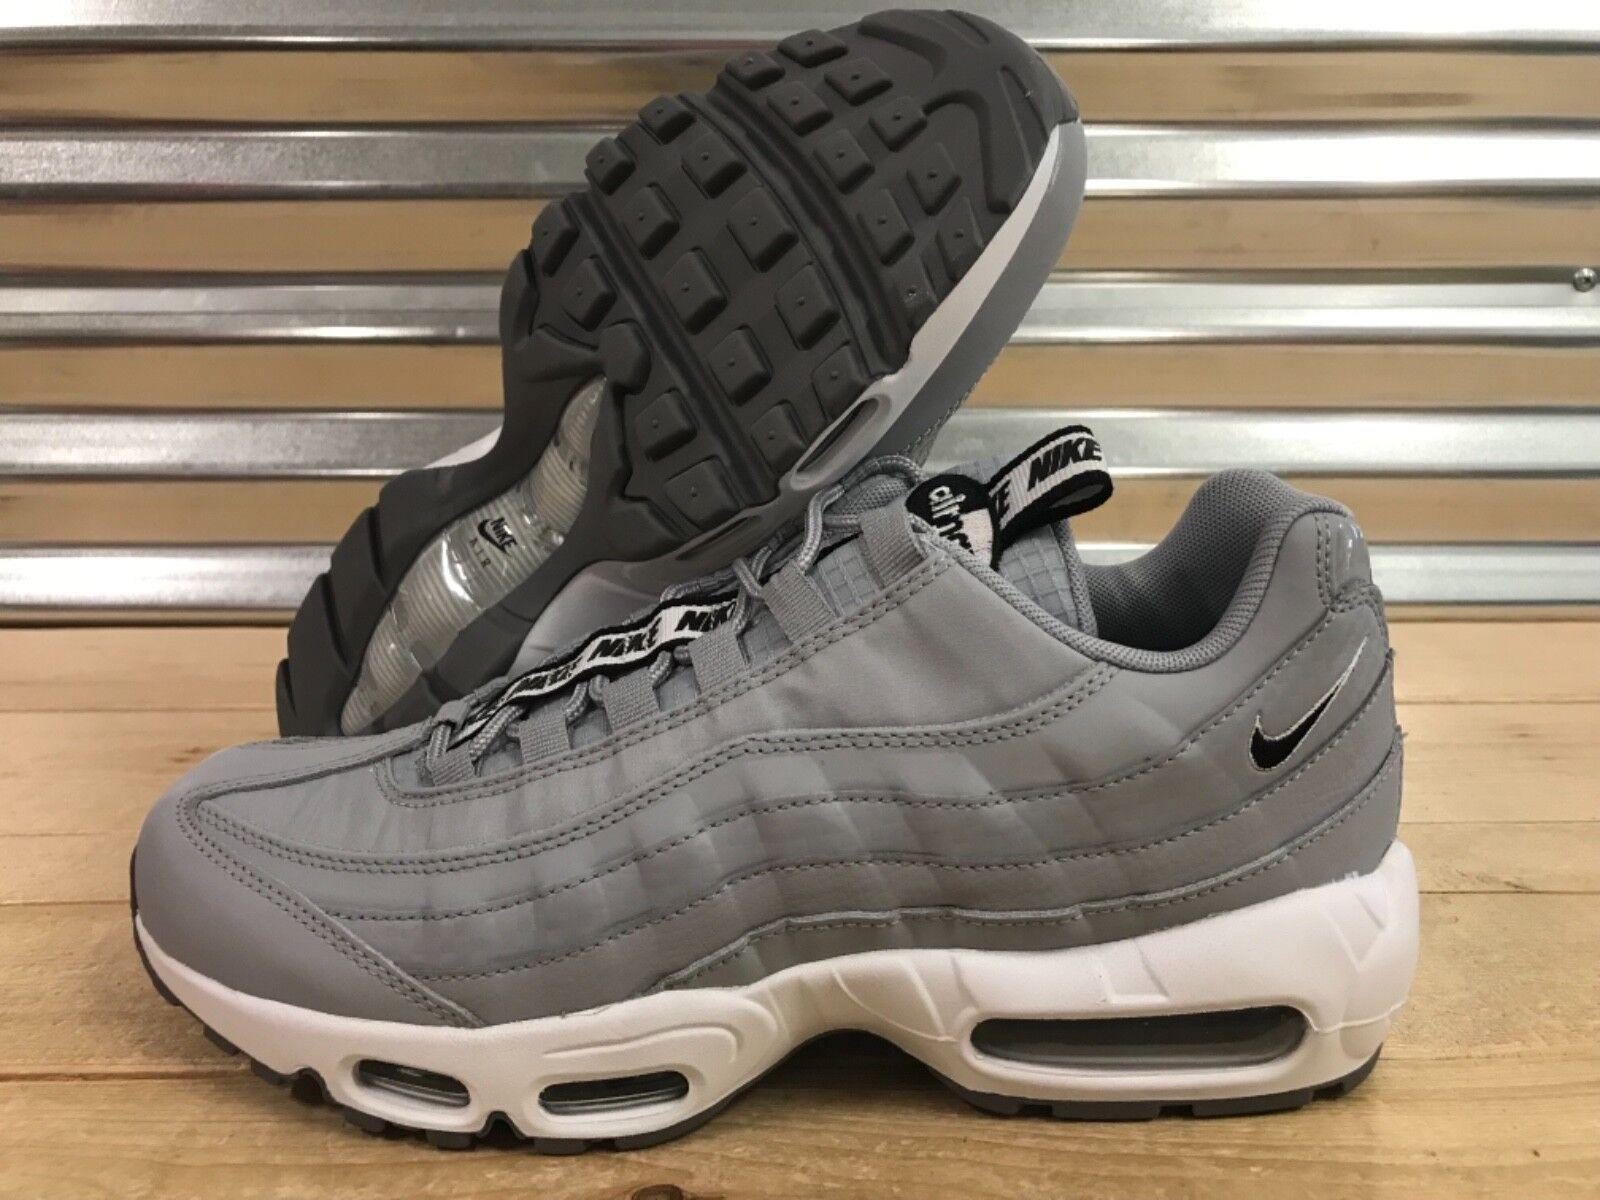 Nike Air Max 95 SE Pull Tab Running shoes Wolf Grey White SZ ( AQ4129-001 )